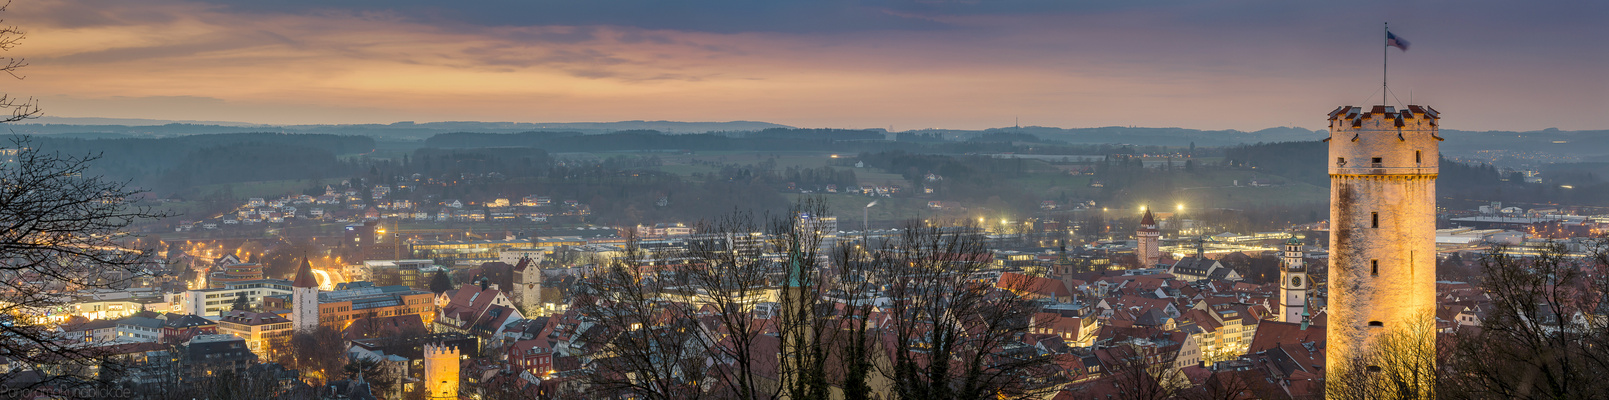 Sonnenuntergang über Ravensburg